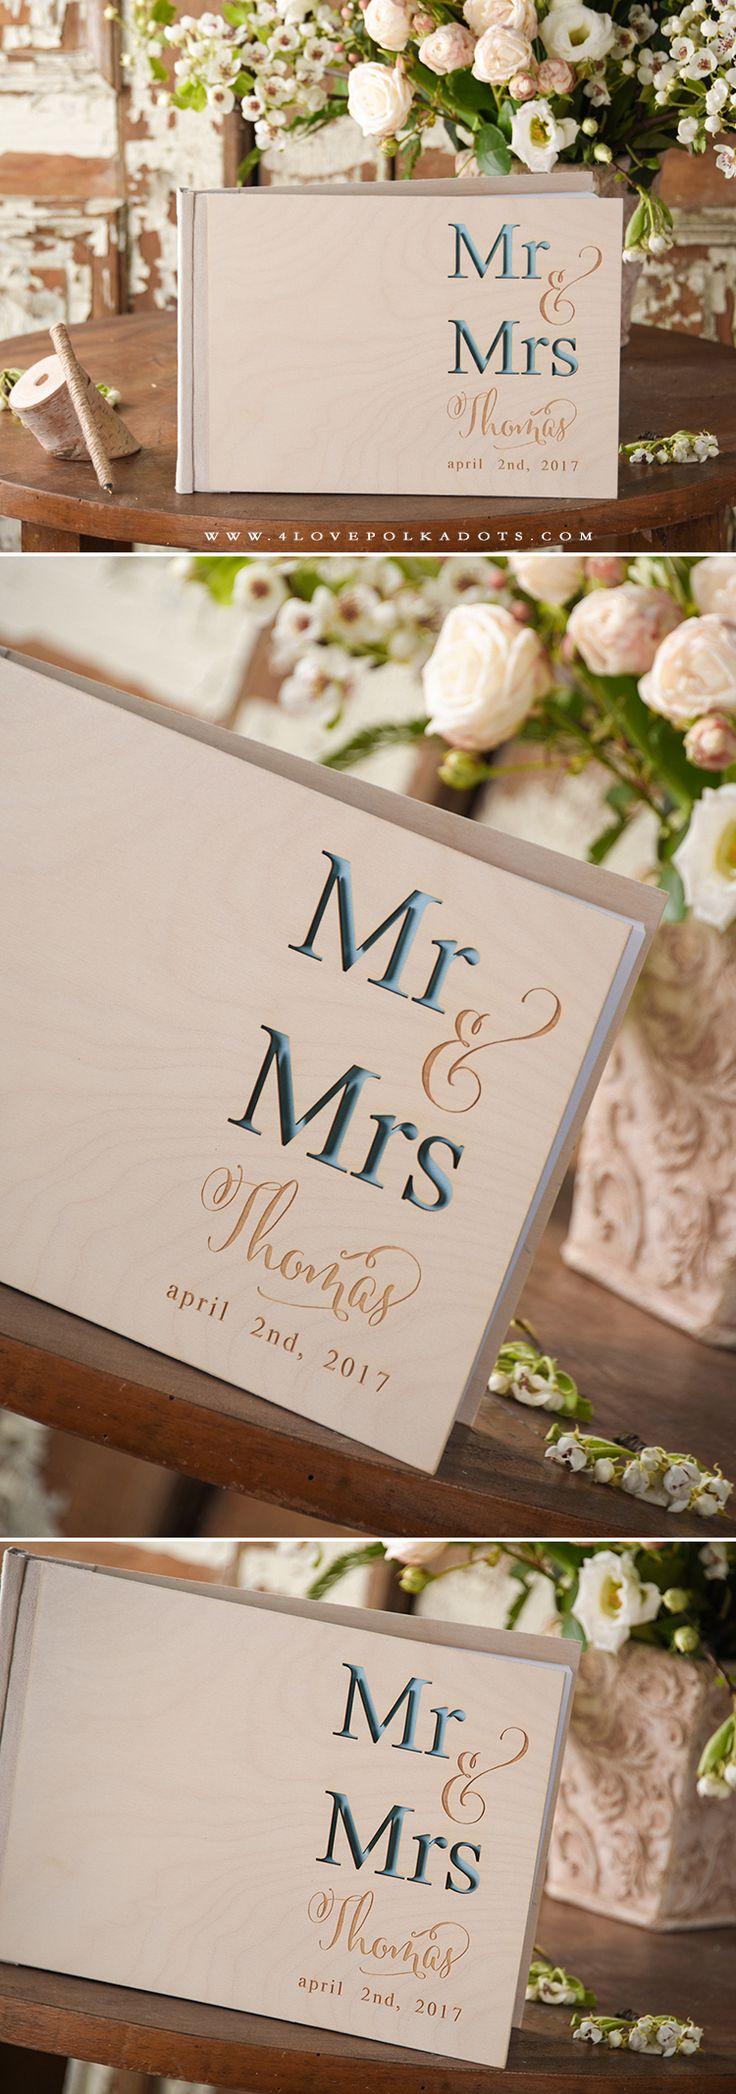 593 best Guest Books & Alternatives   Weddings images on Pinterest ...